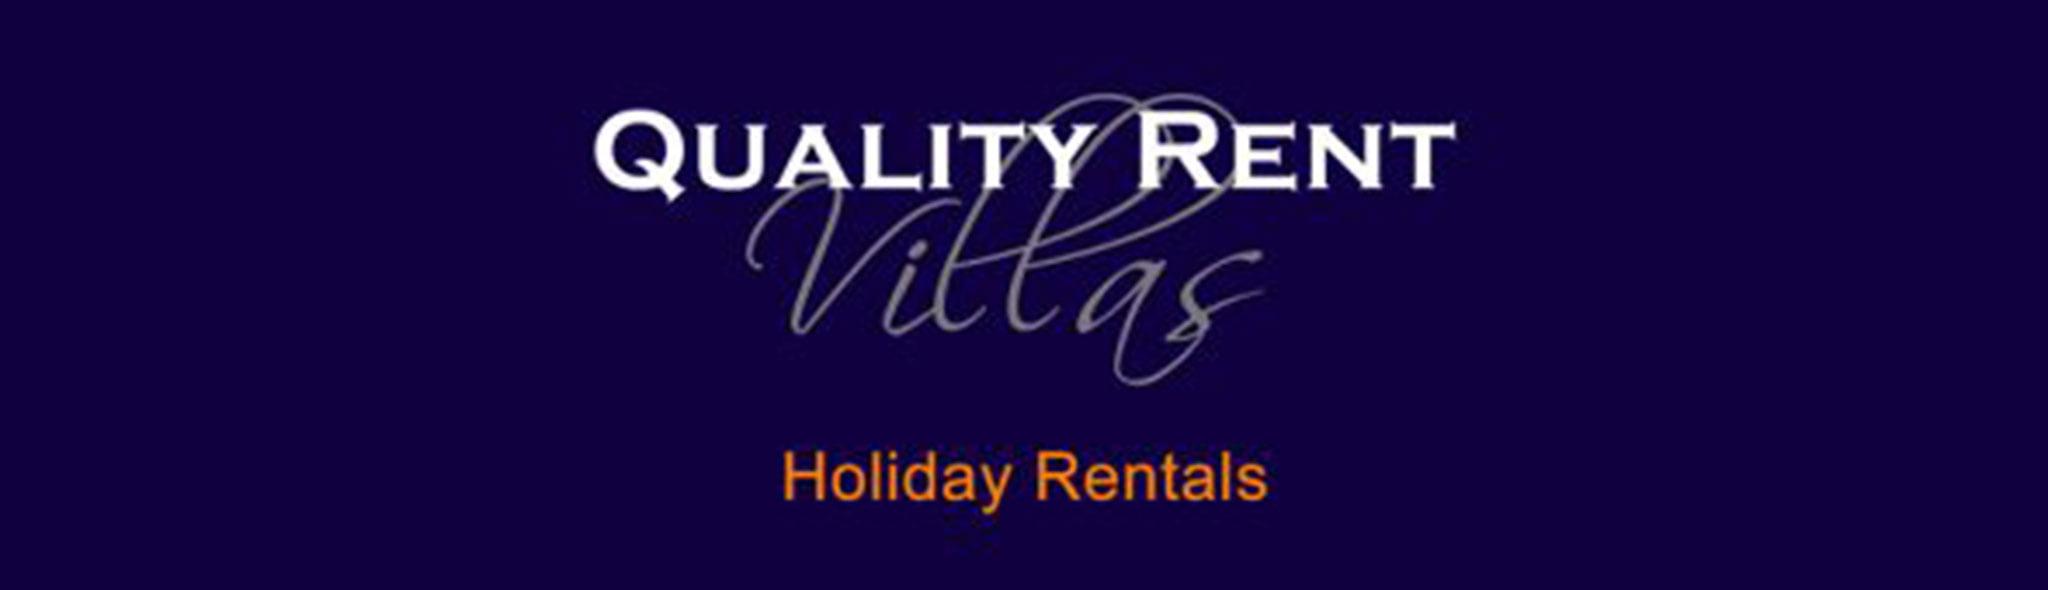 Quality Rent a Villa логотип